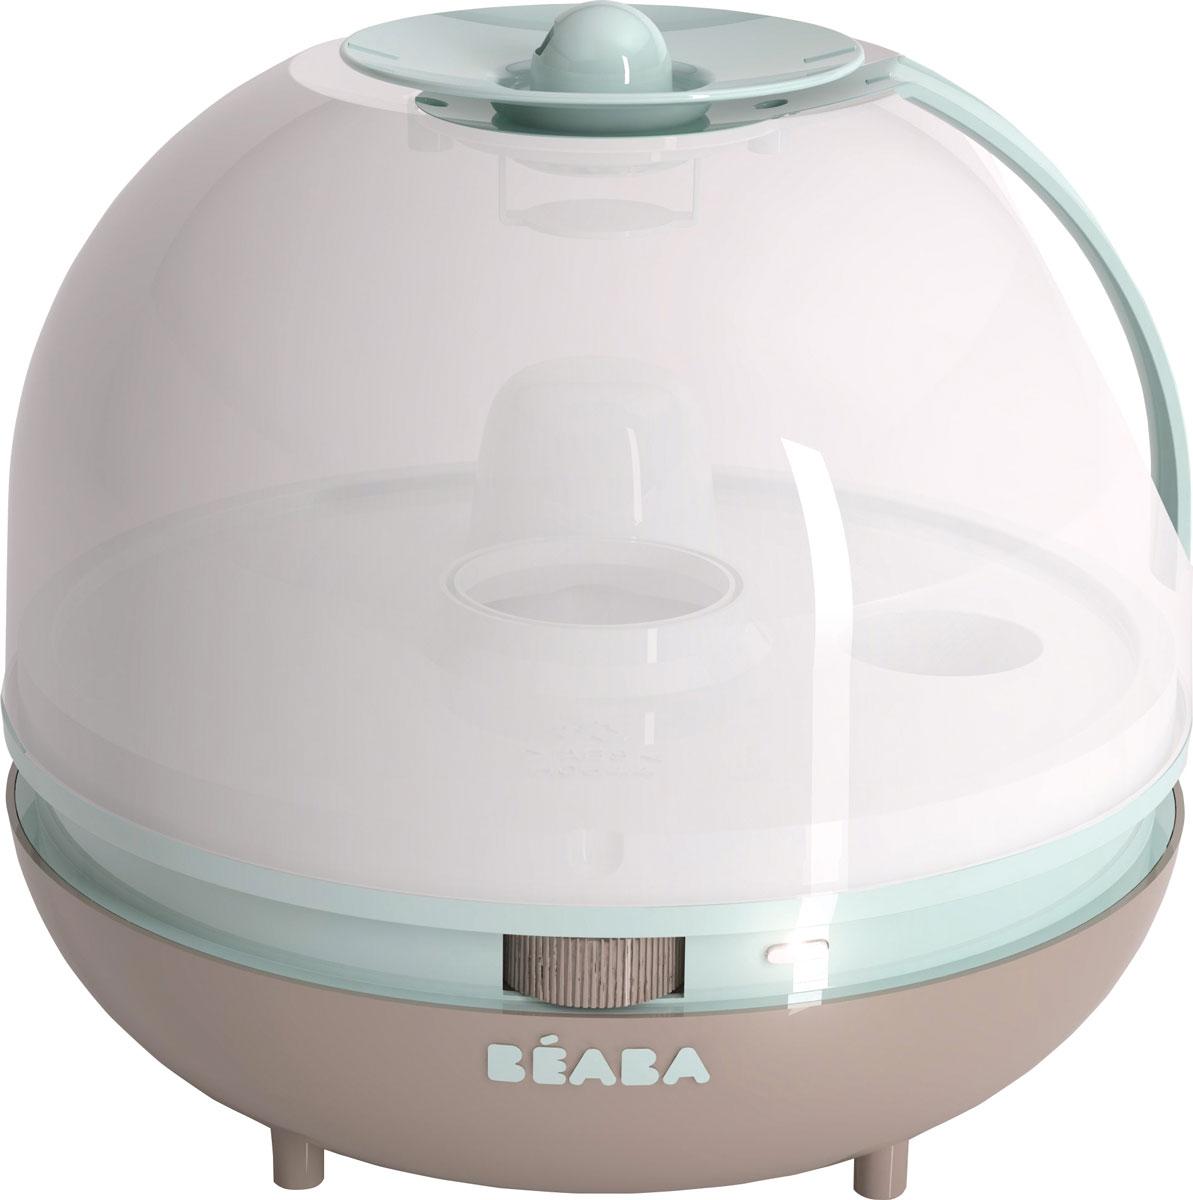 Beaba Увлажнитель воздуха Silenso Humidifer